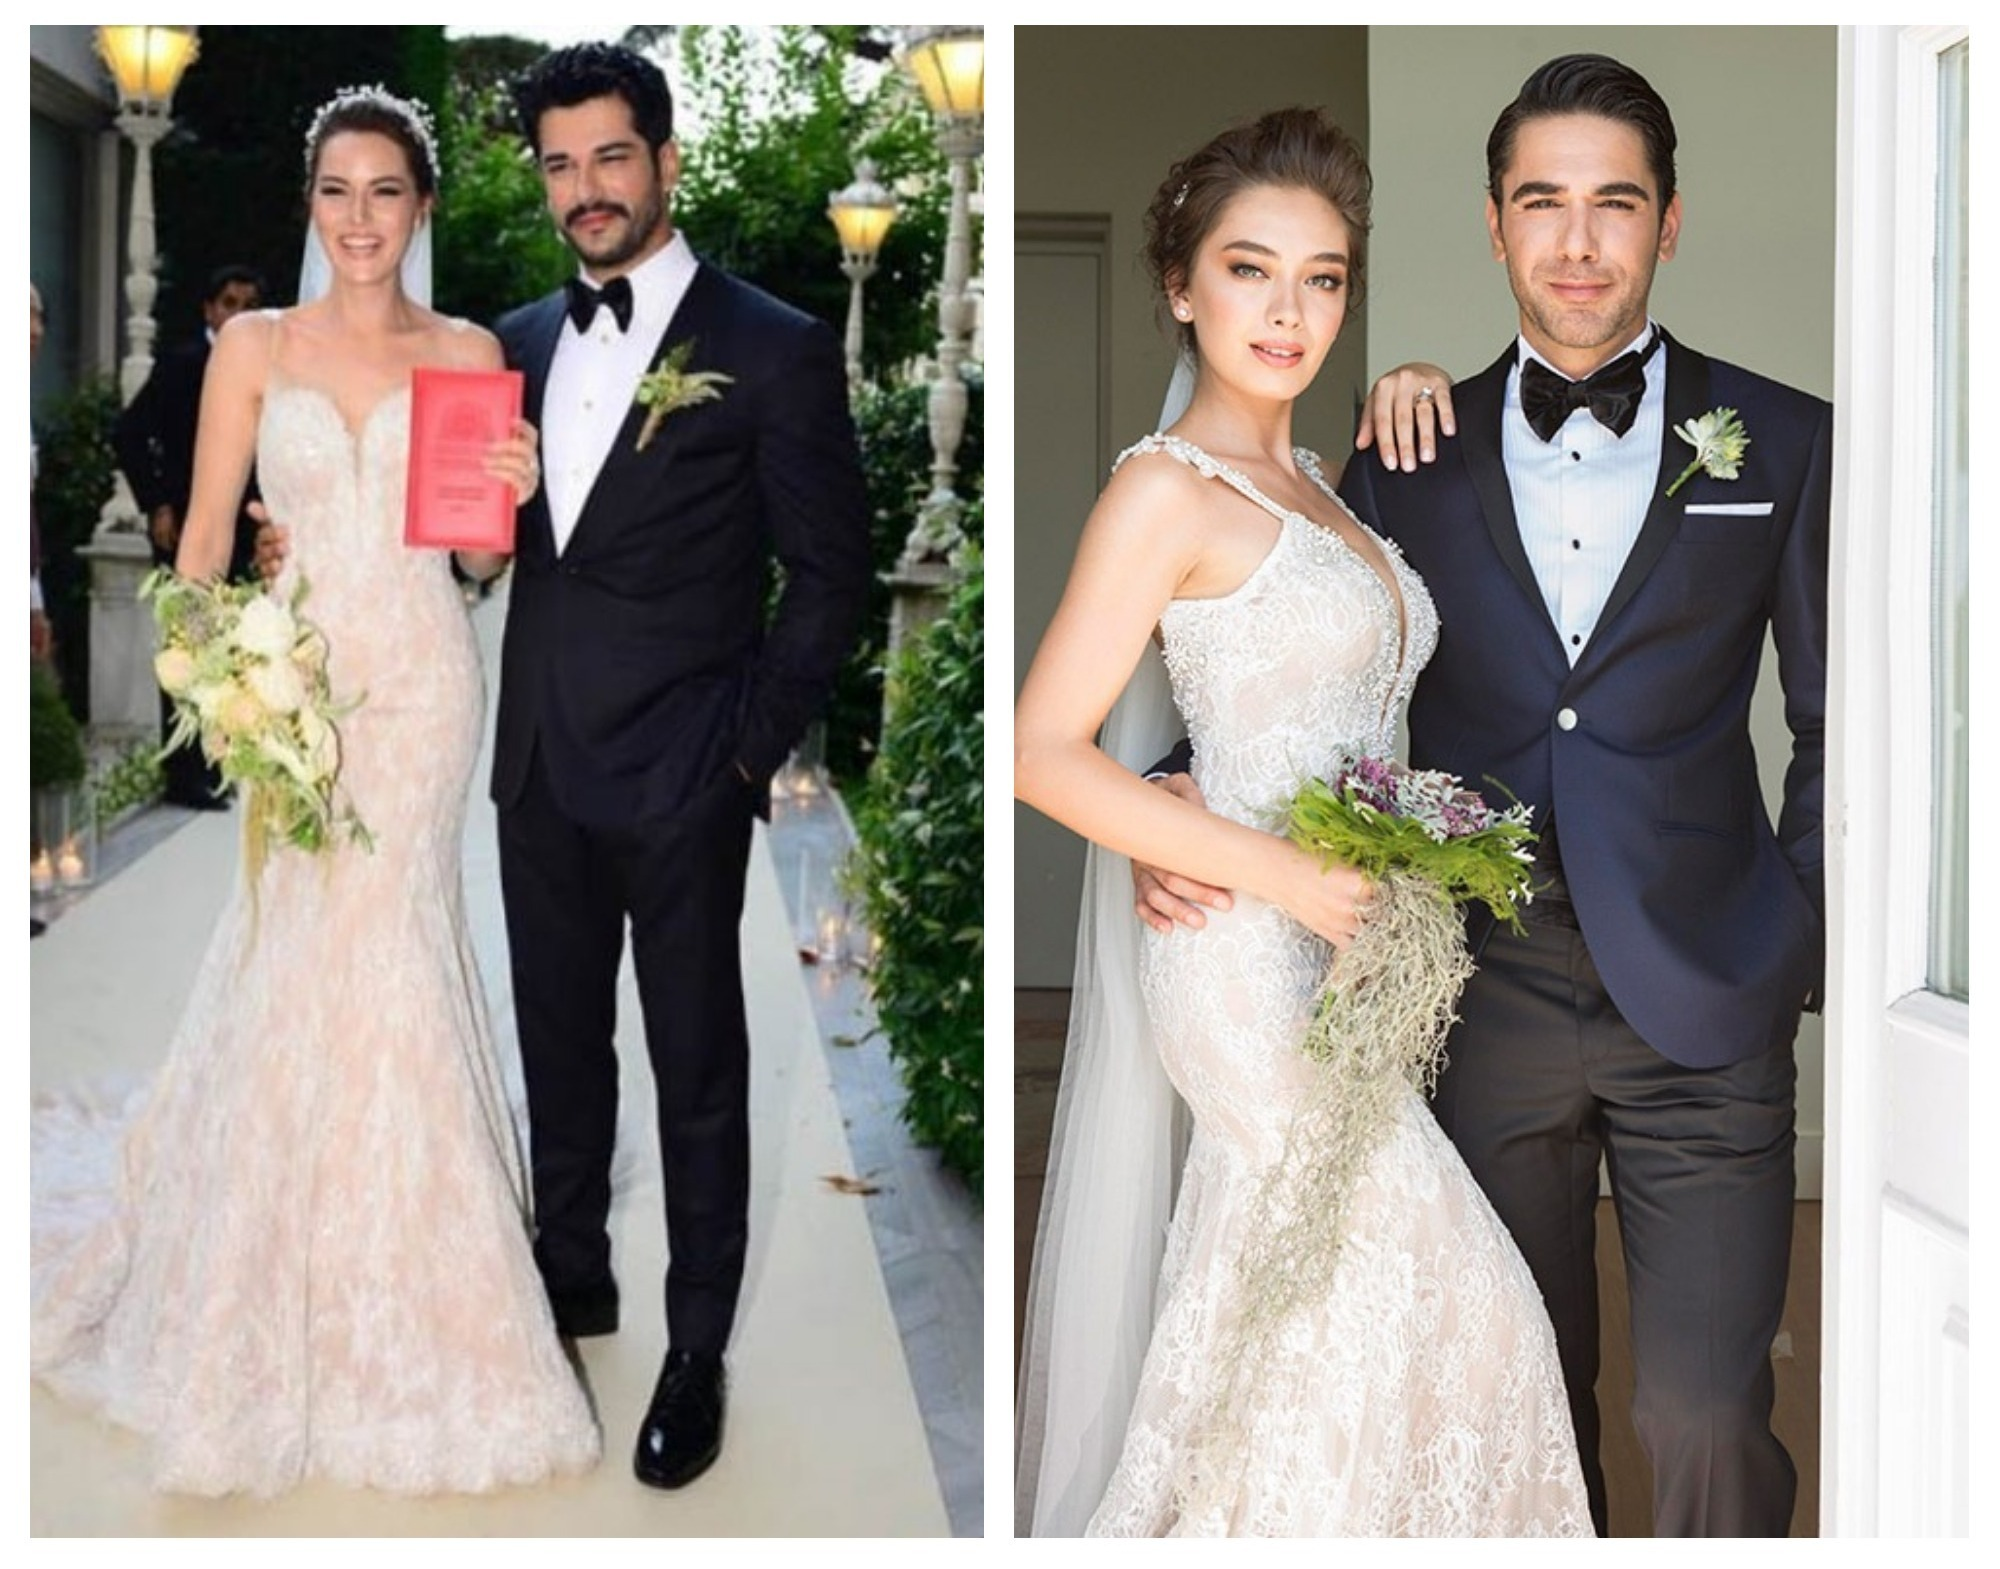 Фото со свадьбы турецкого актера бурака озчивита